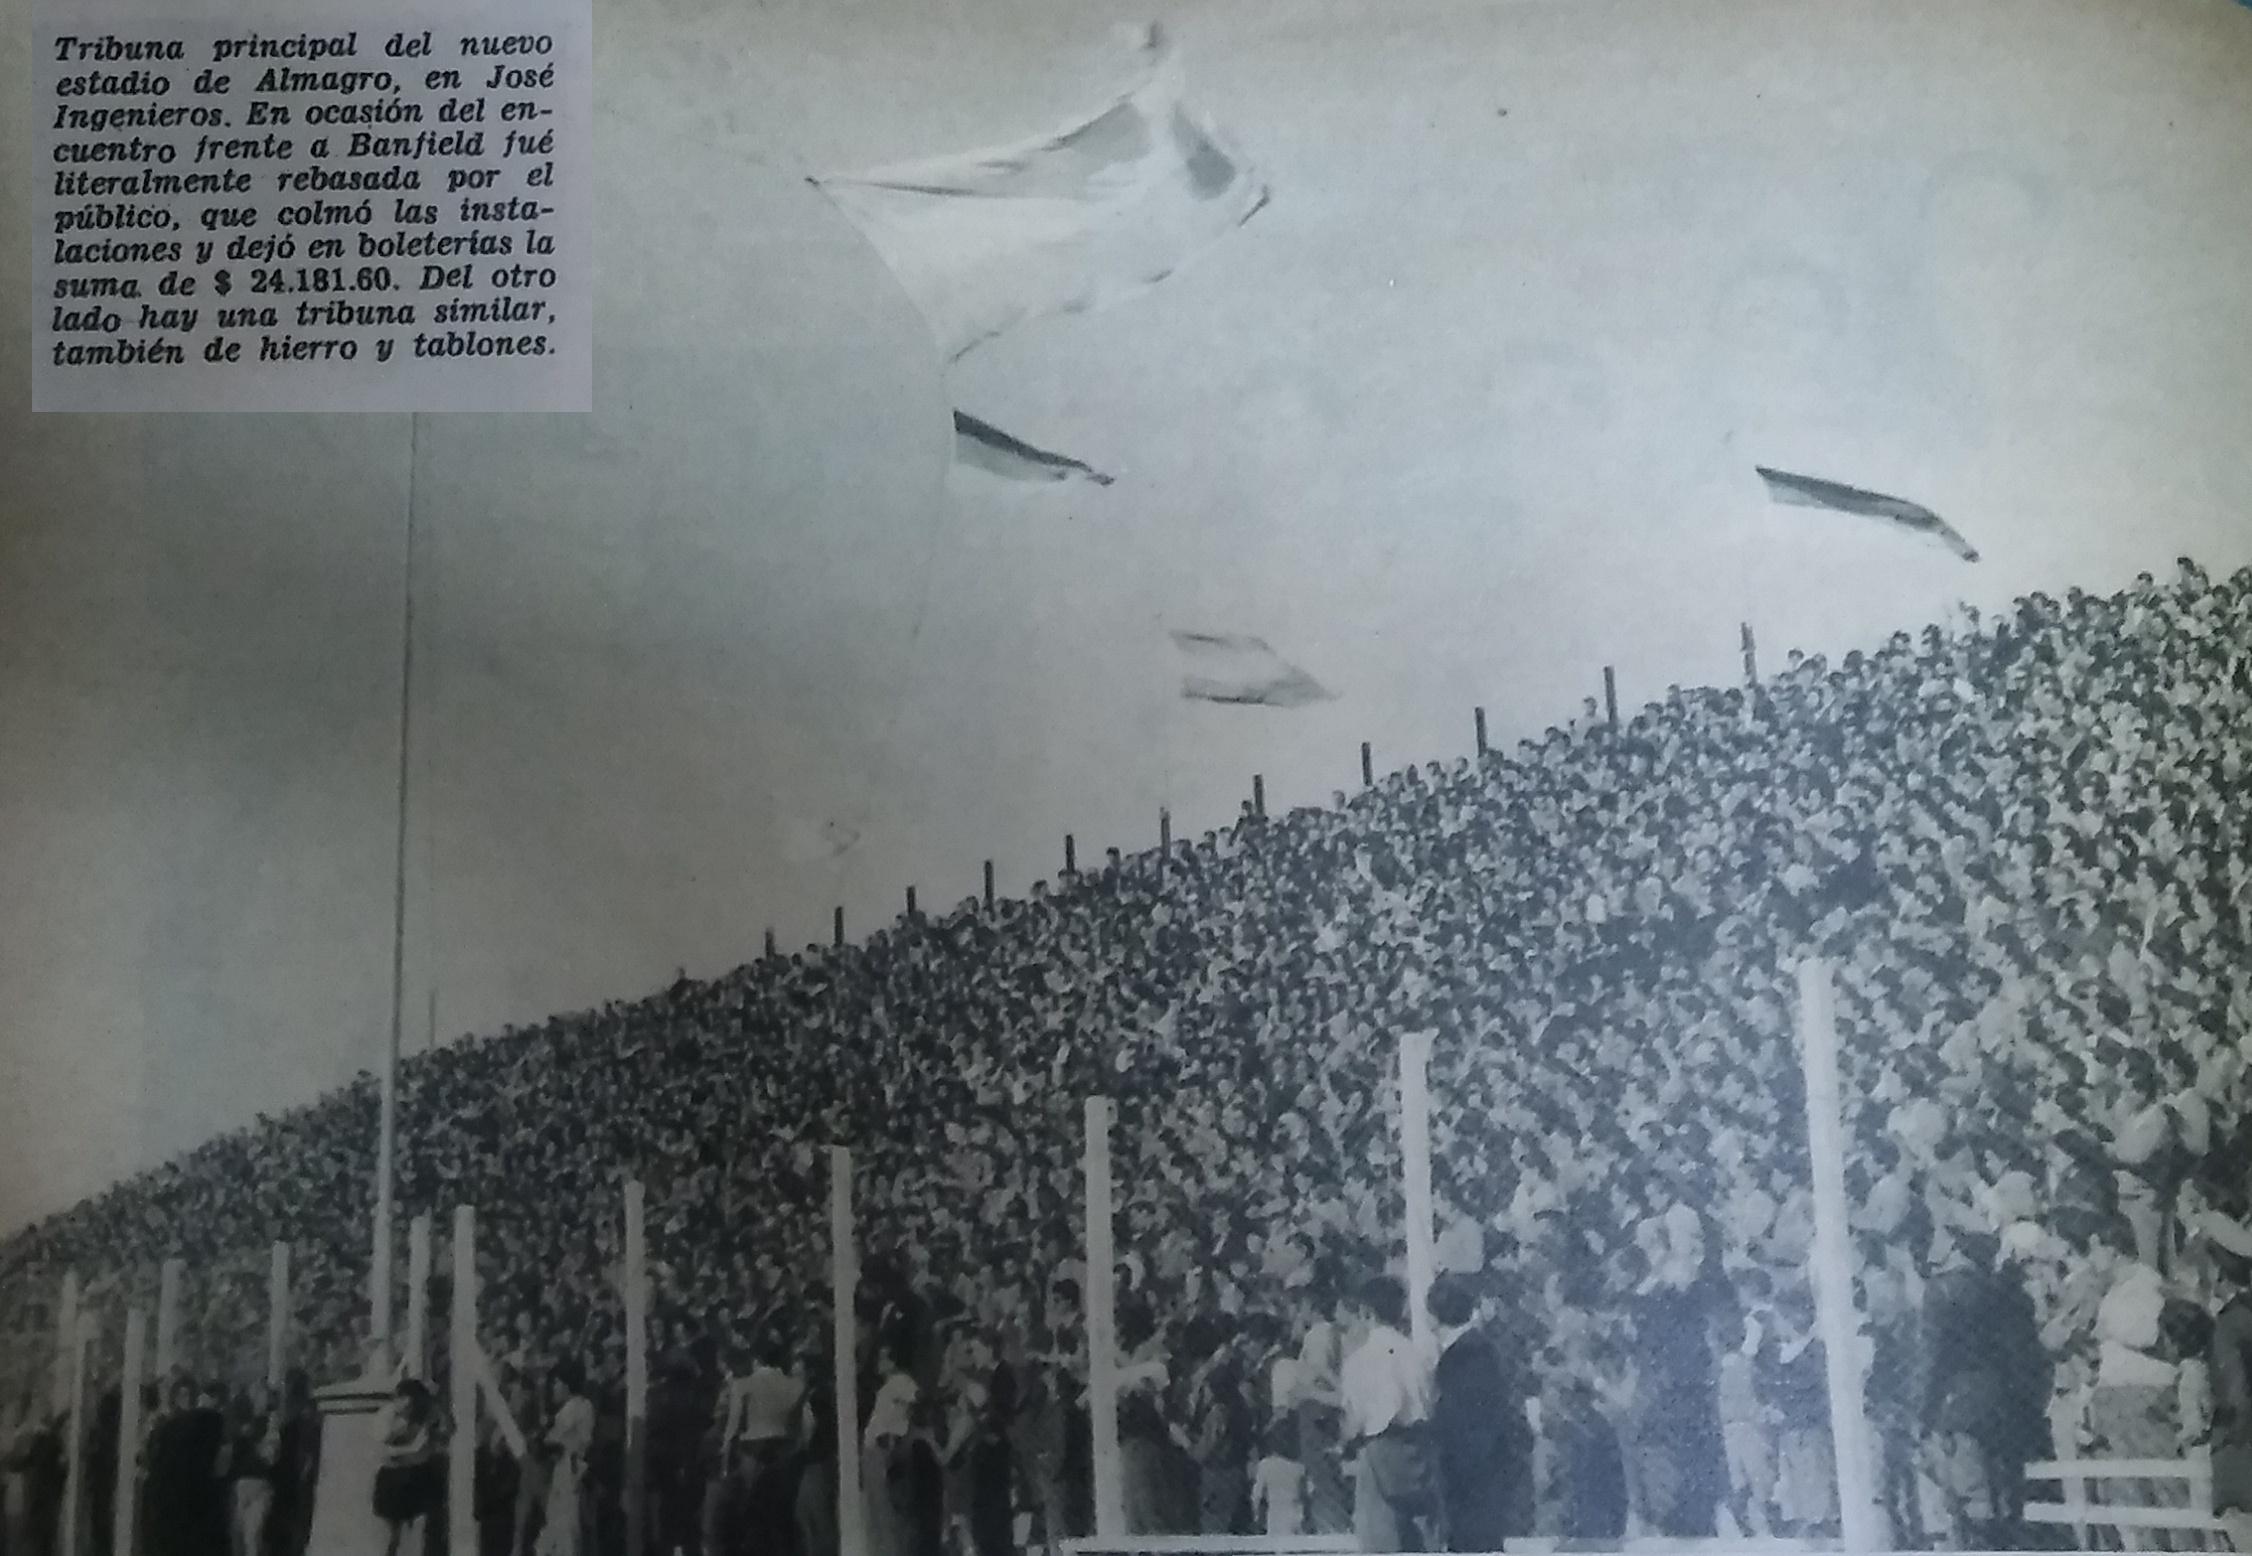 1956-almagro-vs-banfield-tribuna-revista-el-grafico